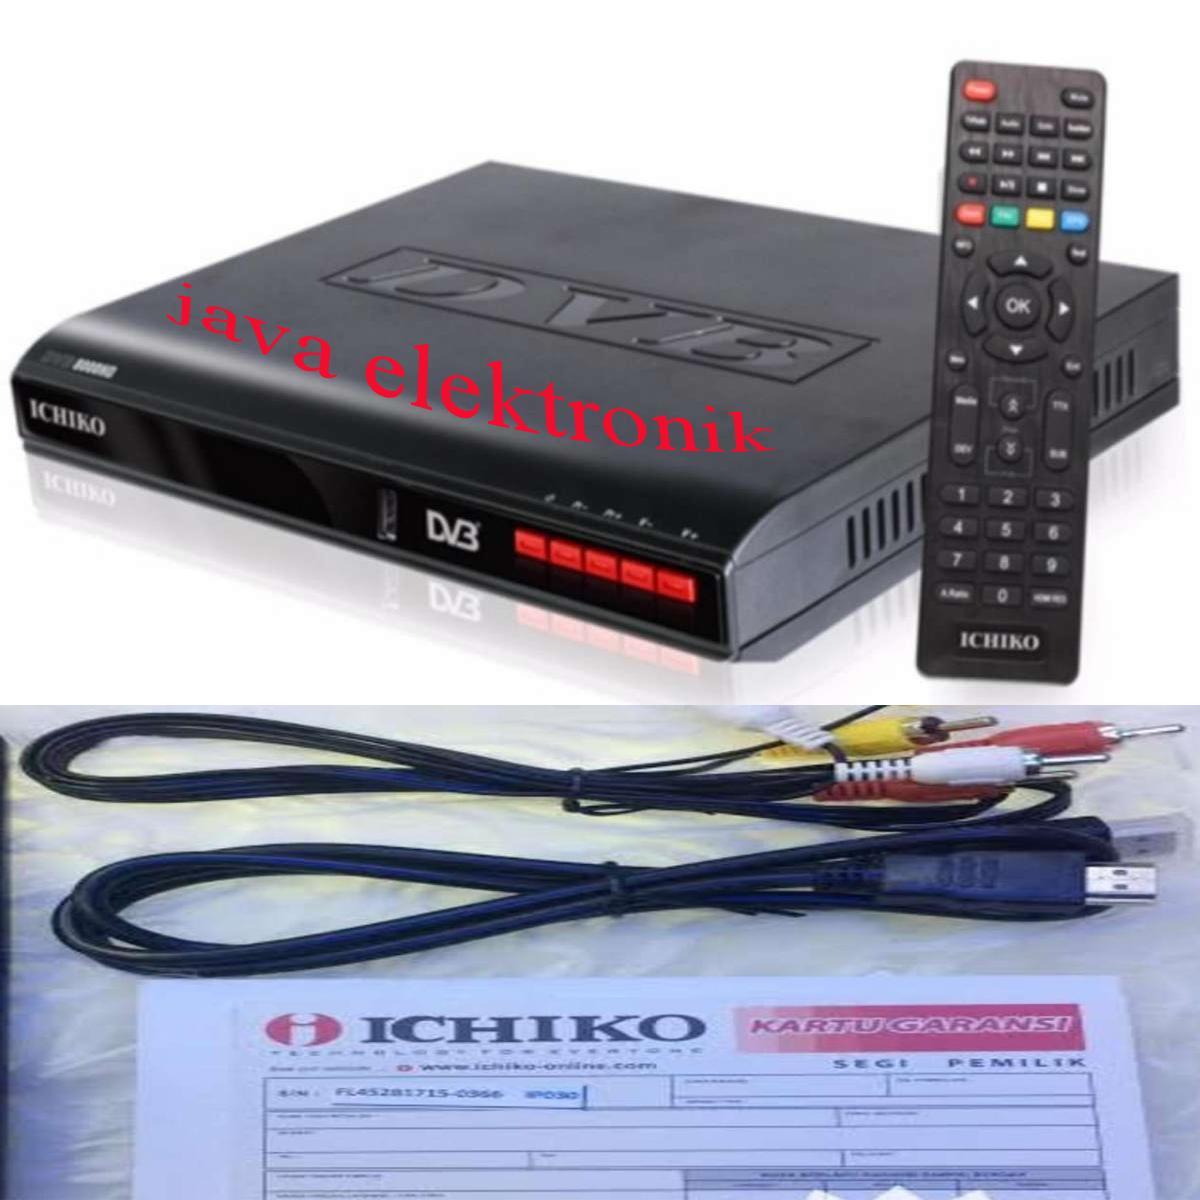 Ichiko DV 8000HD Set Top Box DVB T2 Tv Digital Receiver